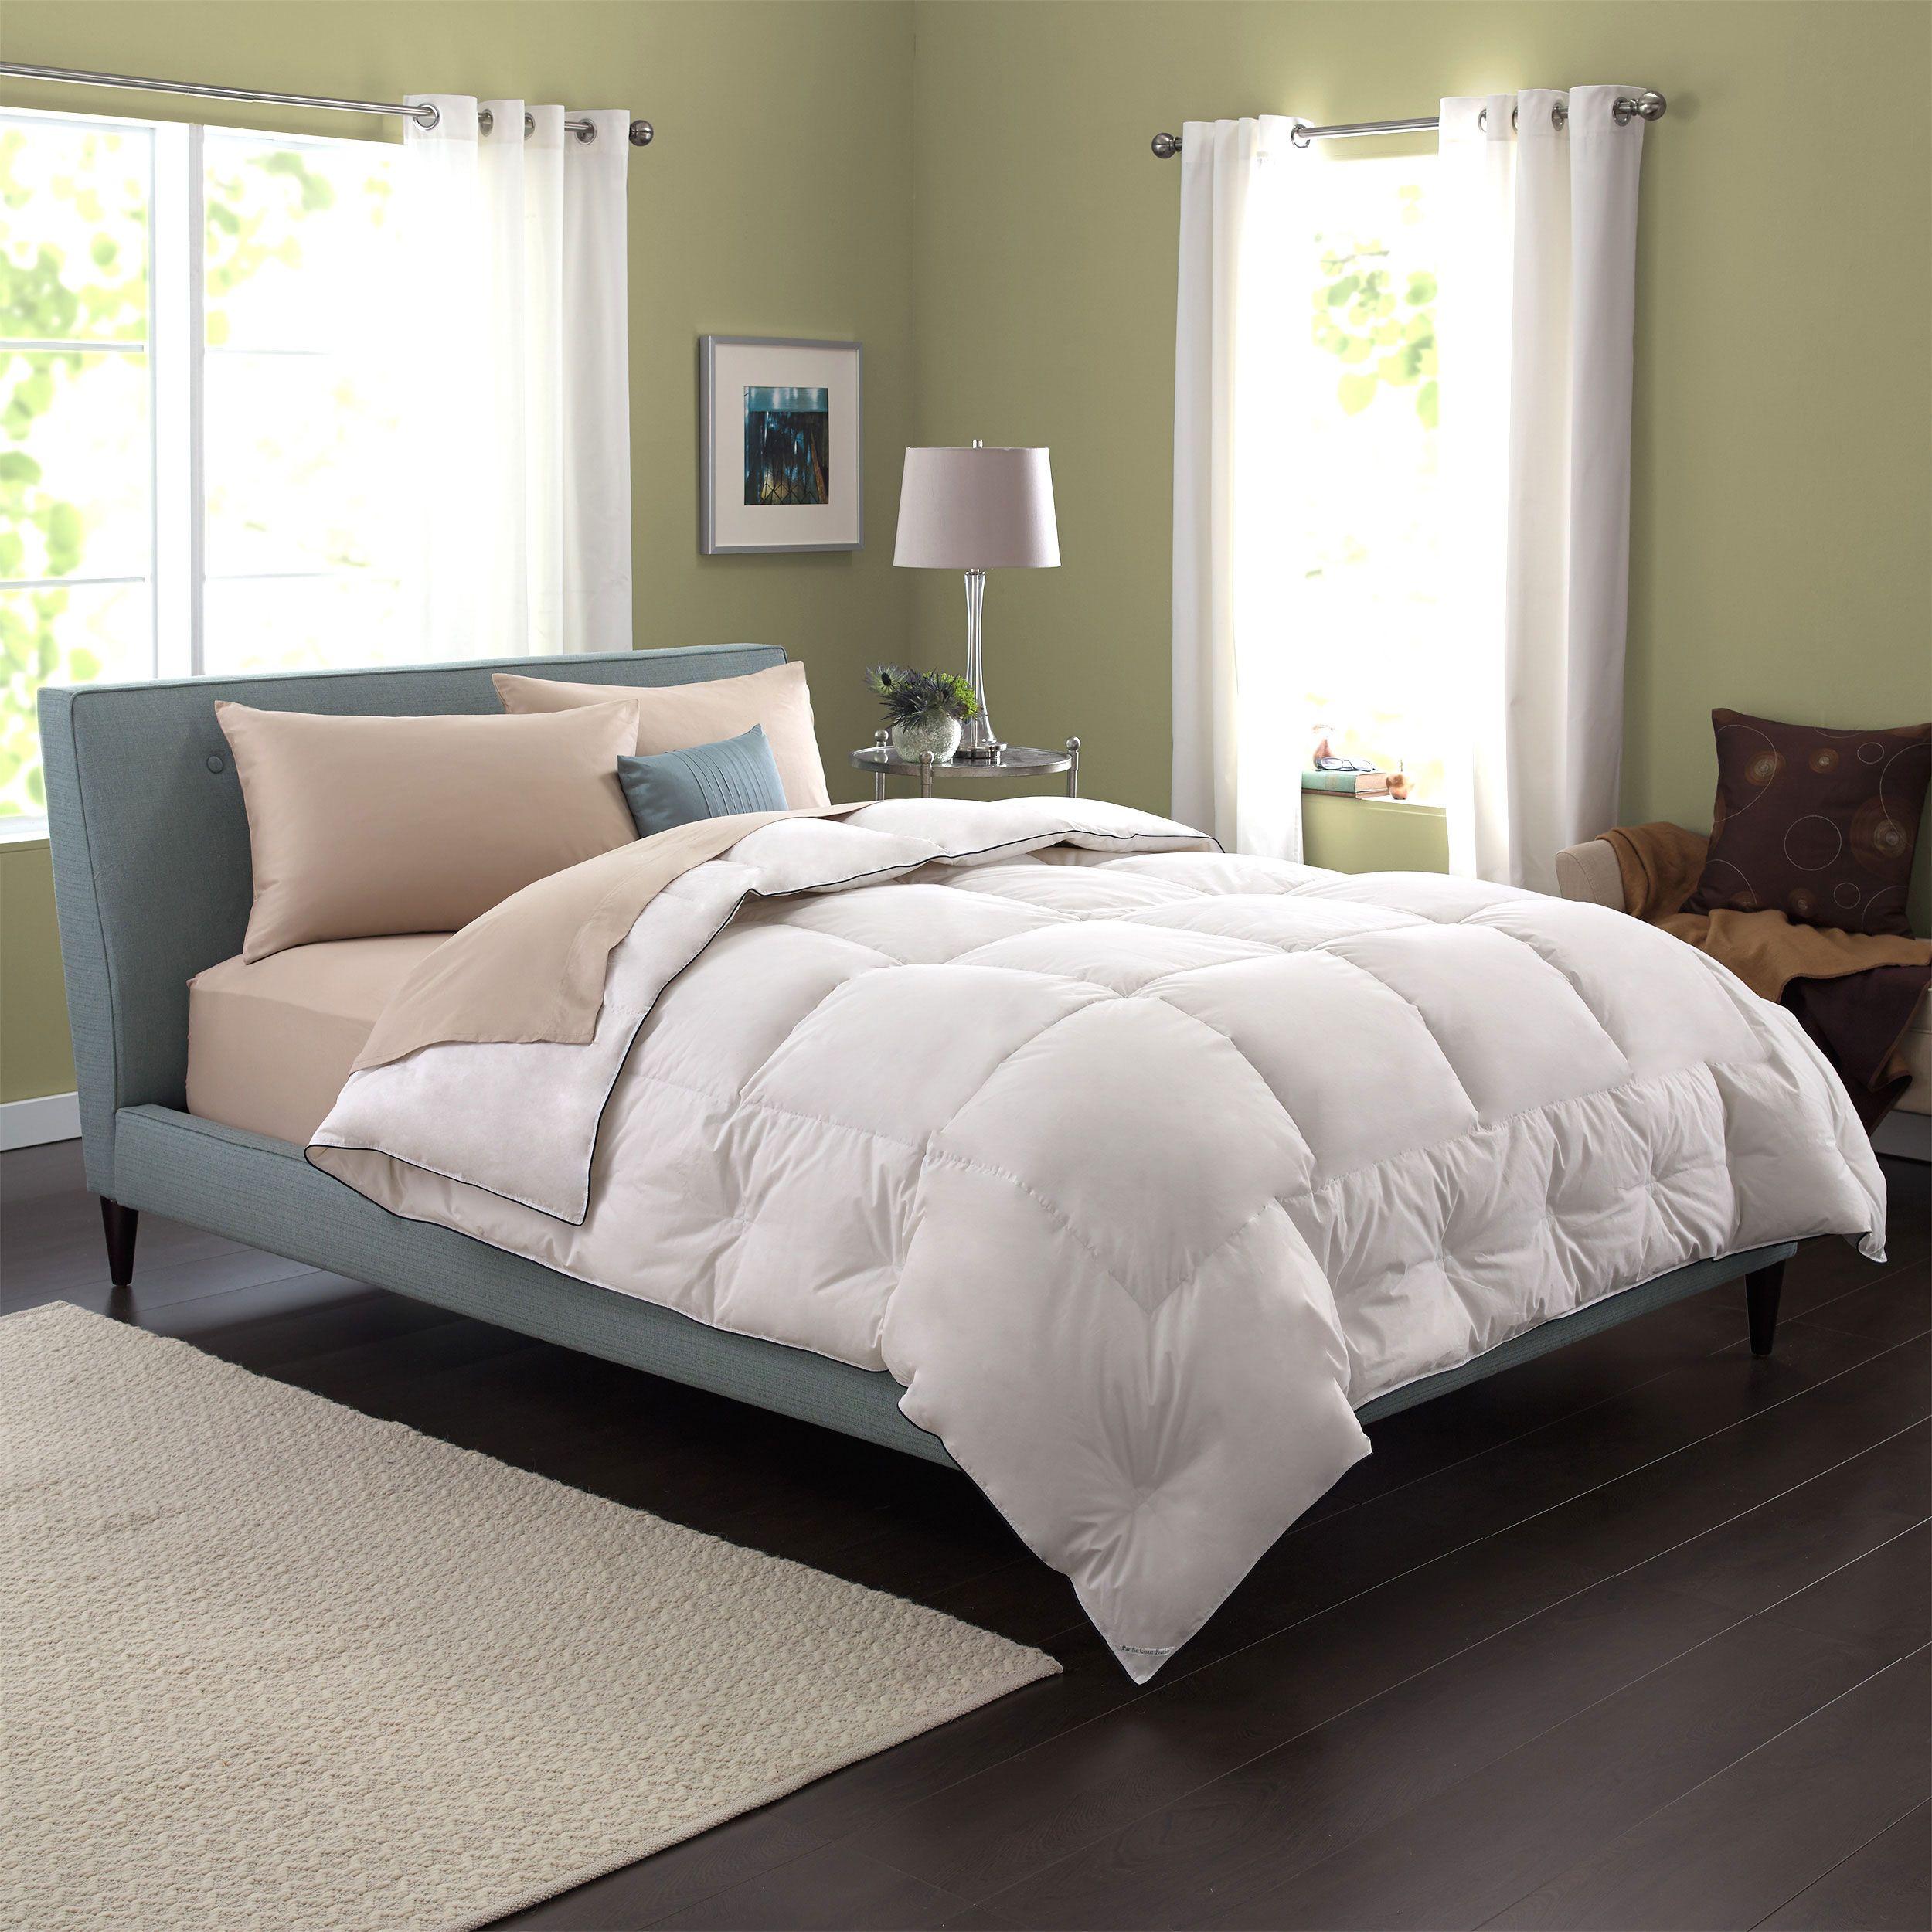 Noble Excellence Extra Warmth Down Comforter Duvet Insert Duvet